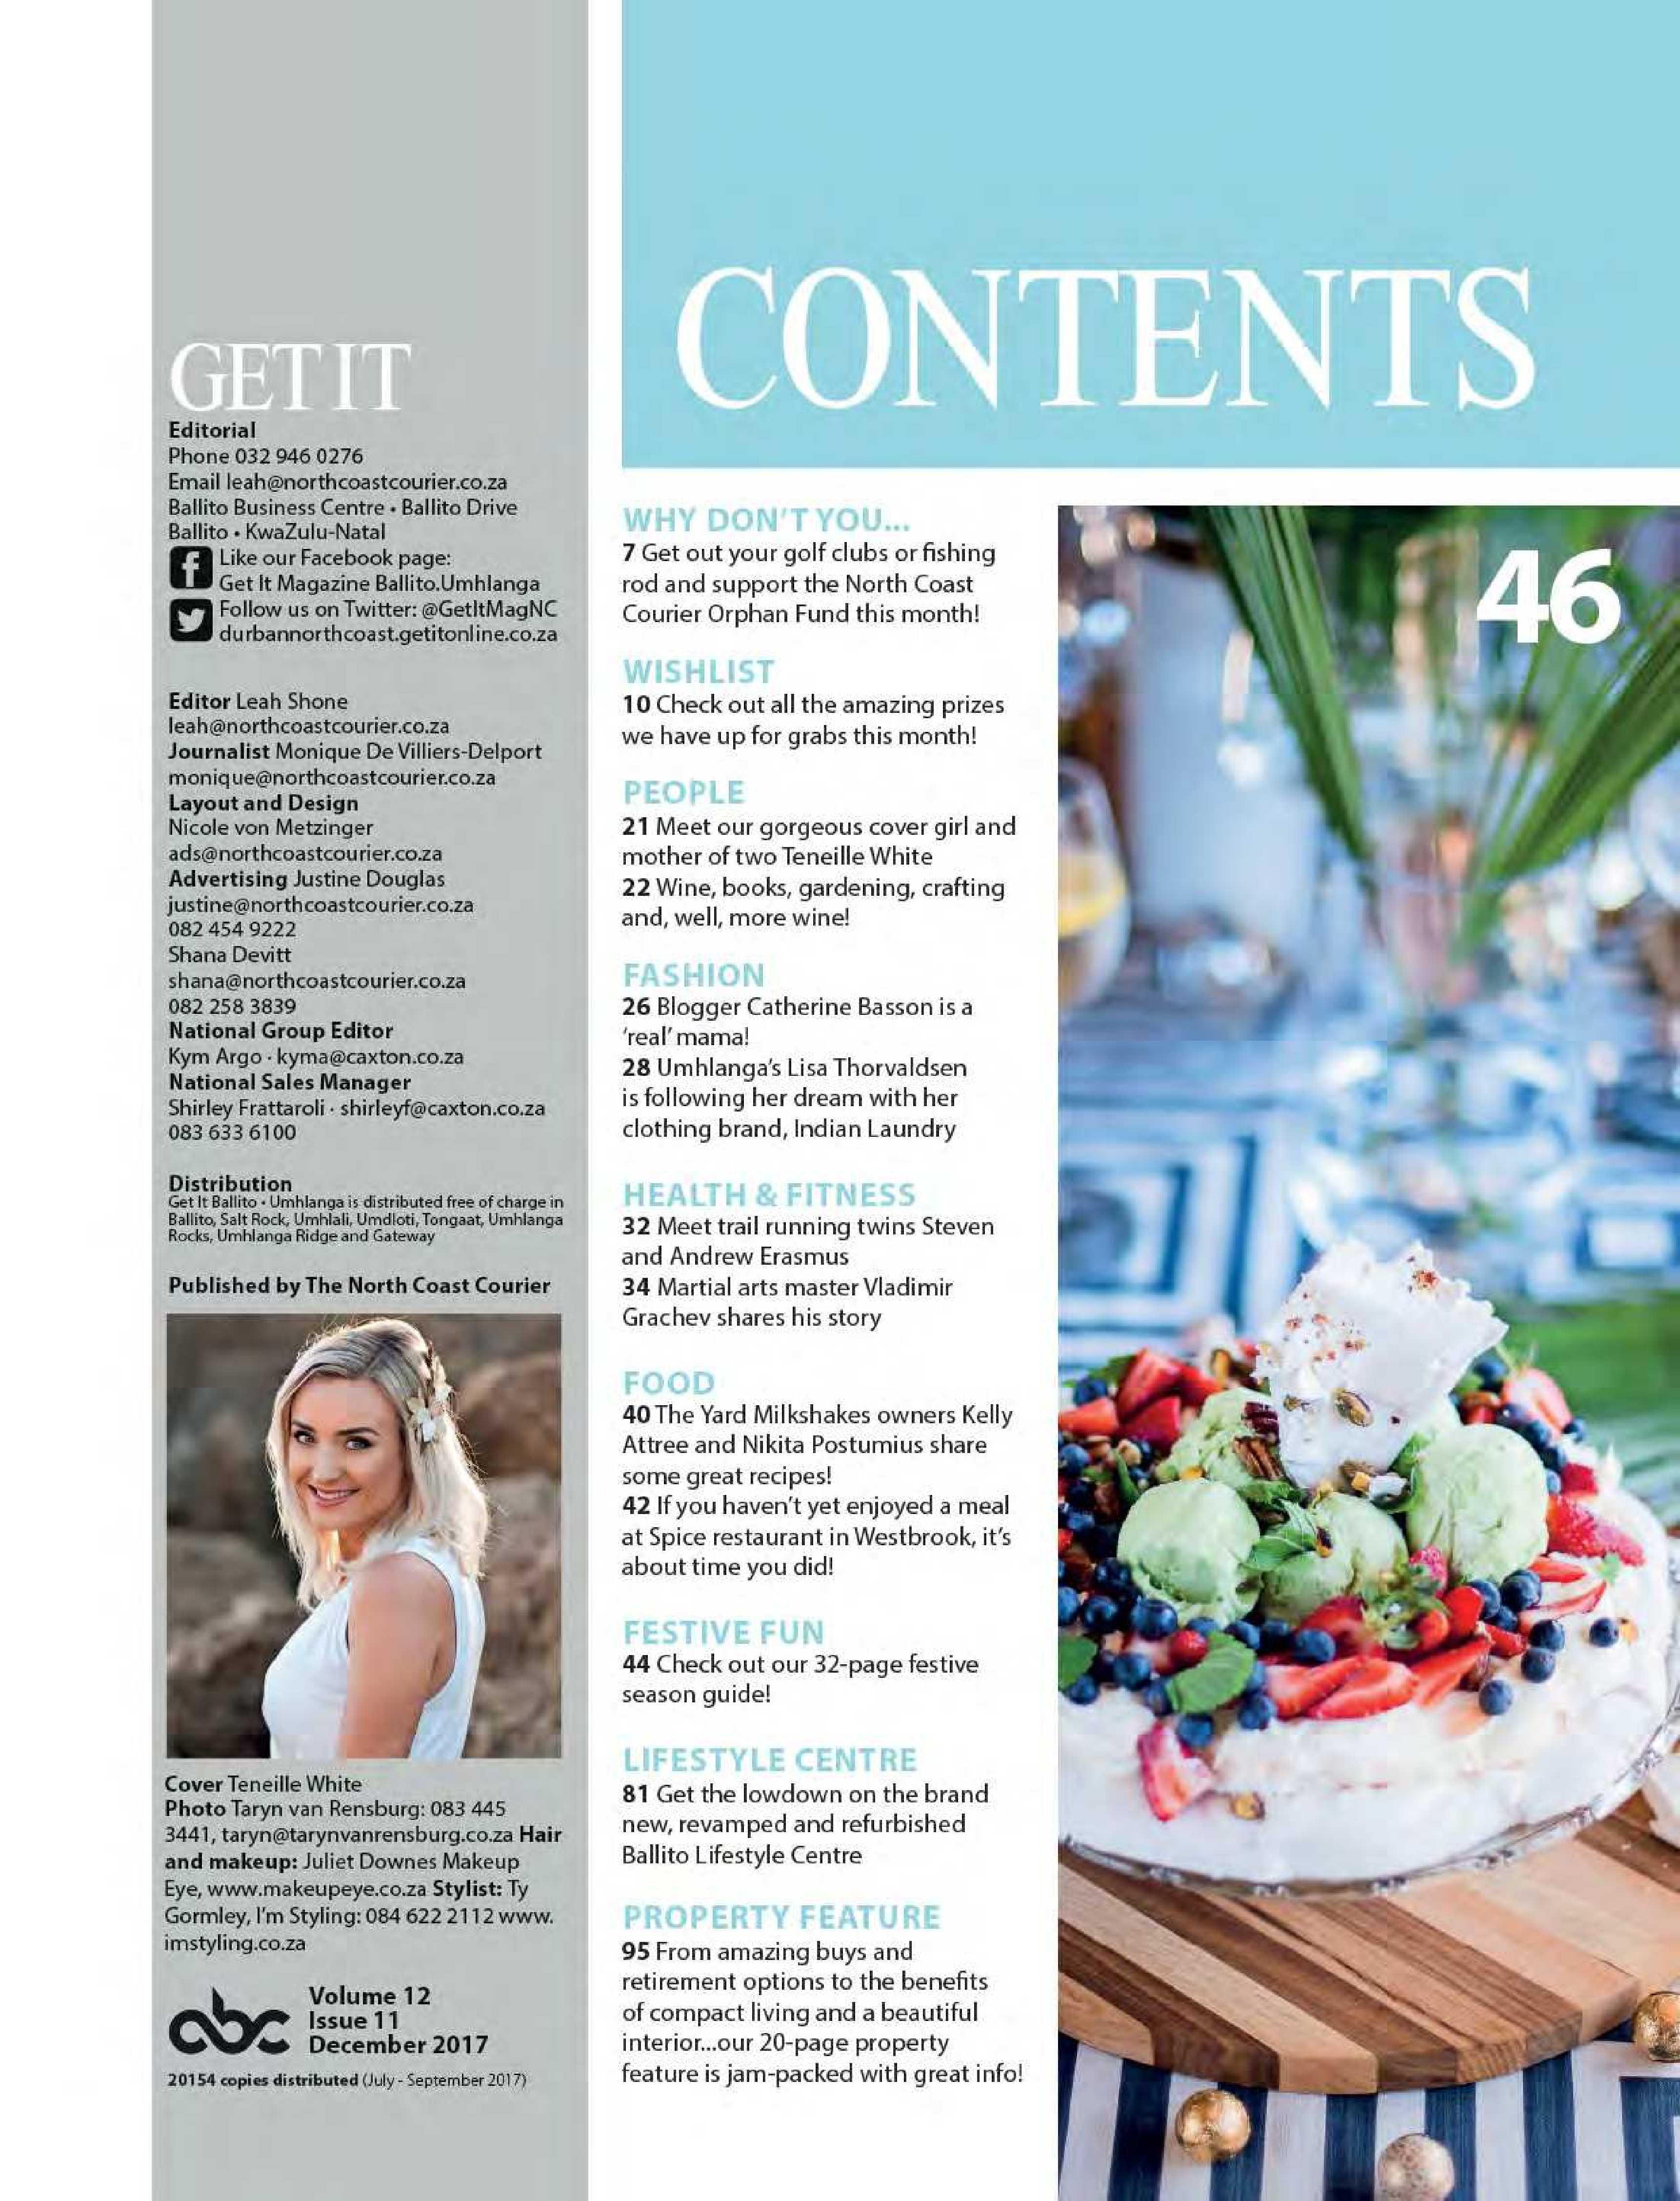 get-magazine-ballitoumhlanga-december-2017-january-2018-2-epapers-page-7